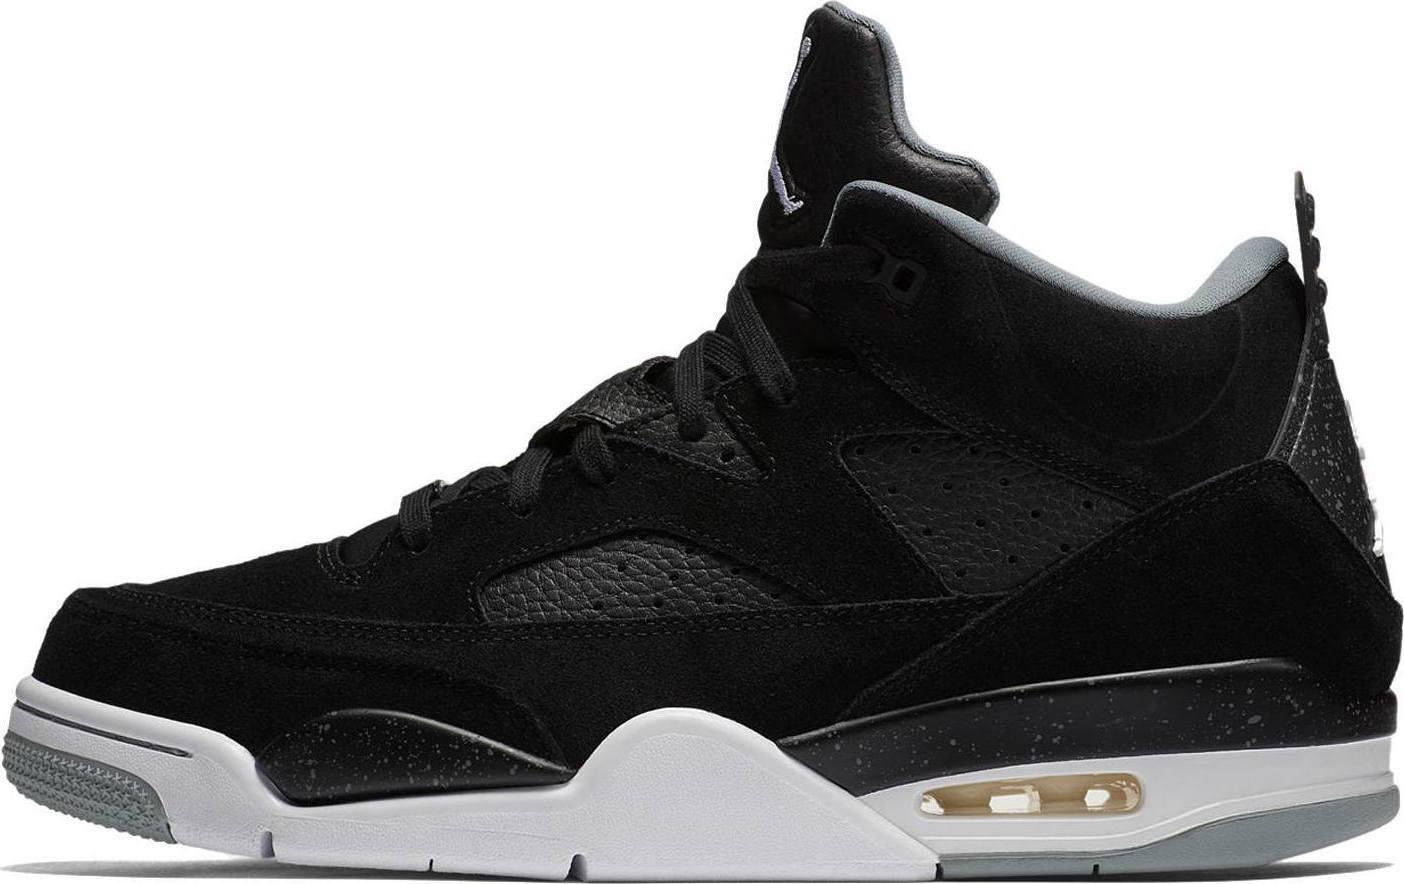 4b1c85ec9e4 Προσθήκη στα αγαπημένα menu Nike Jordan Son Of Mars Low 580603-001